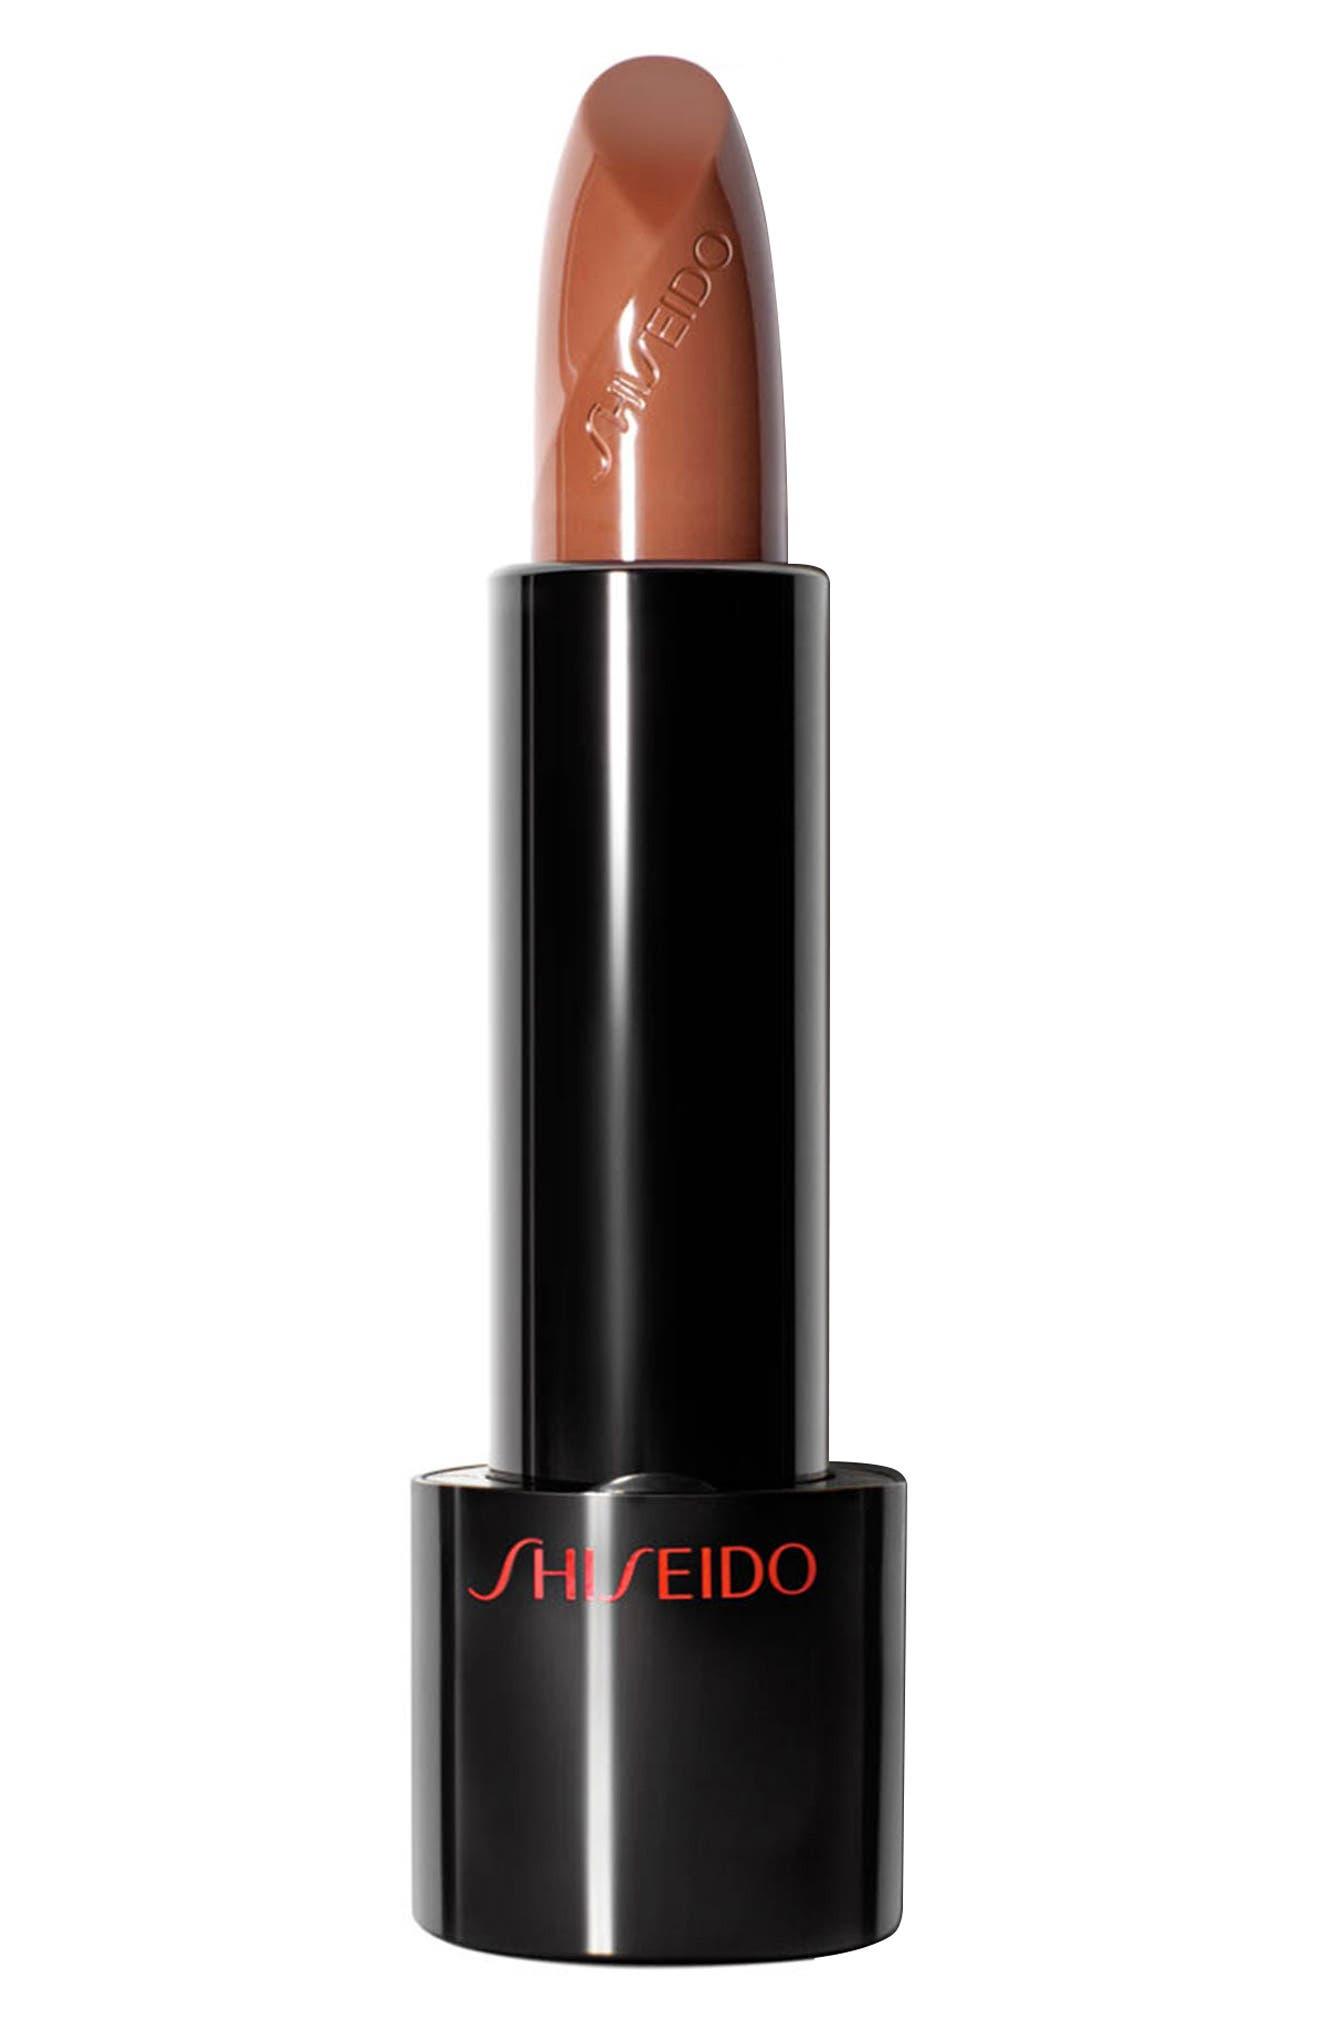 Shiseido Rouge Rouge Lipstick